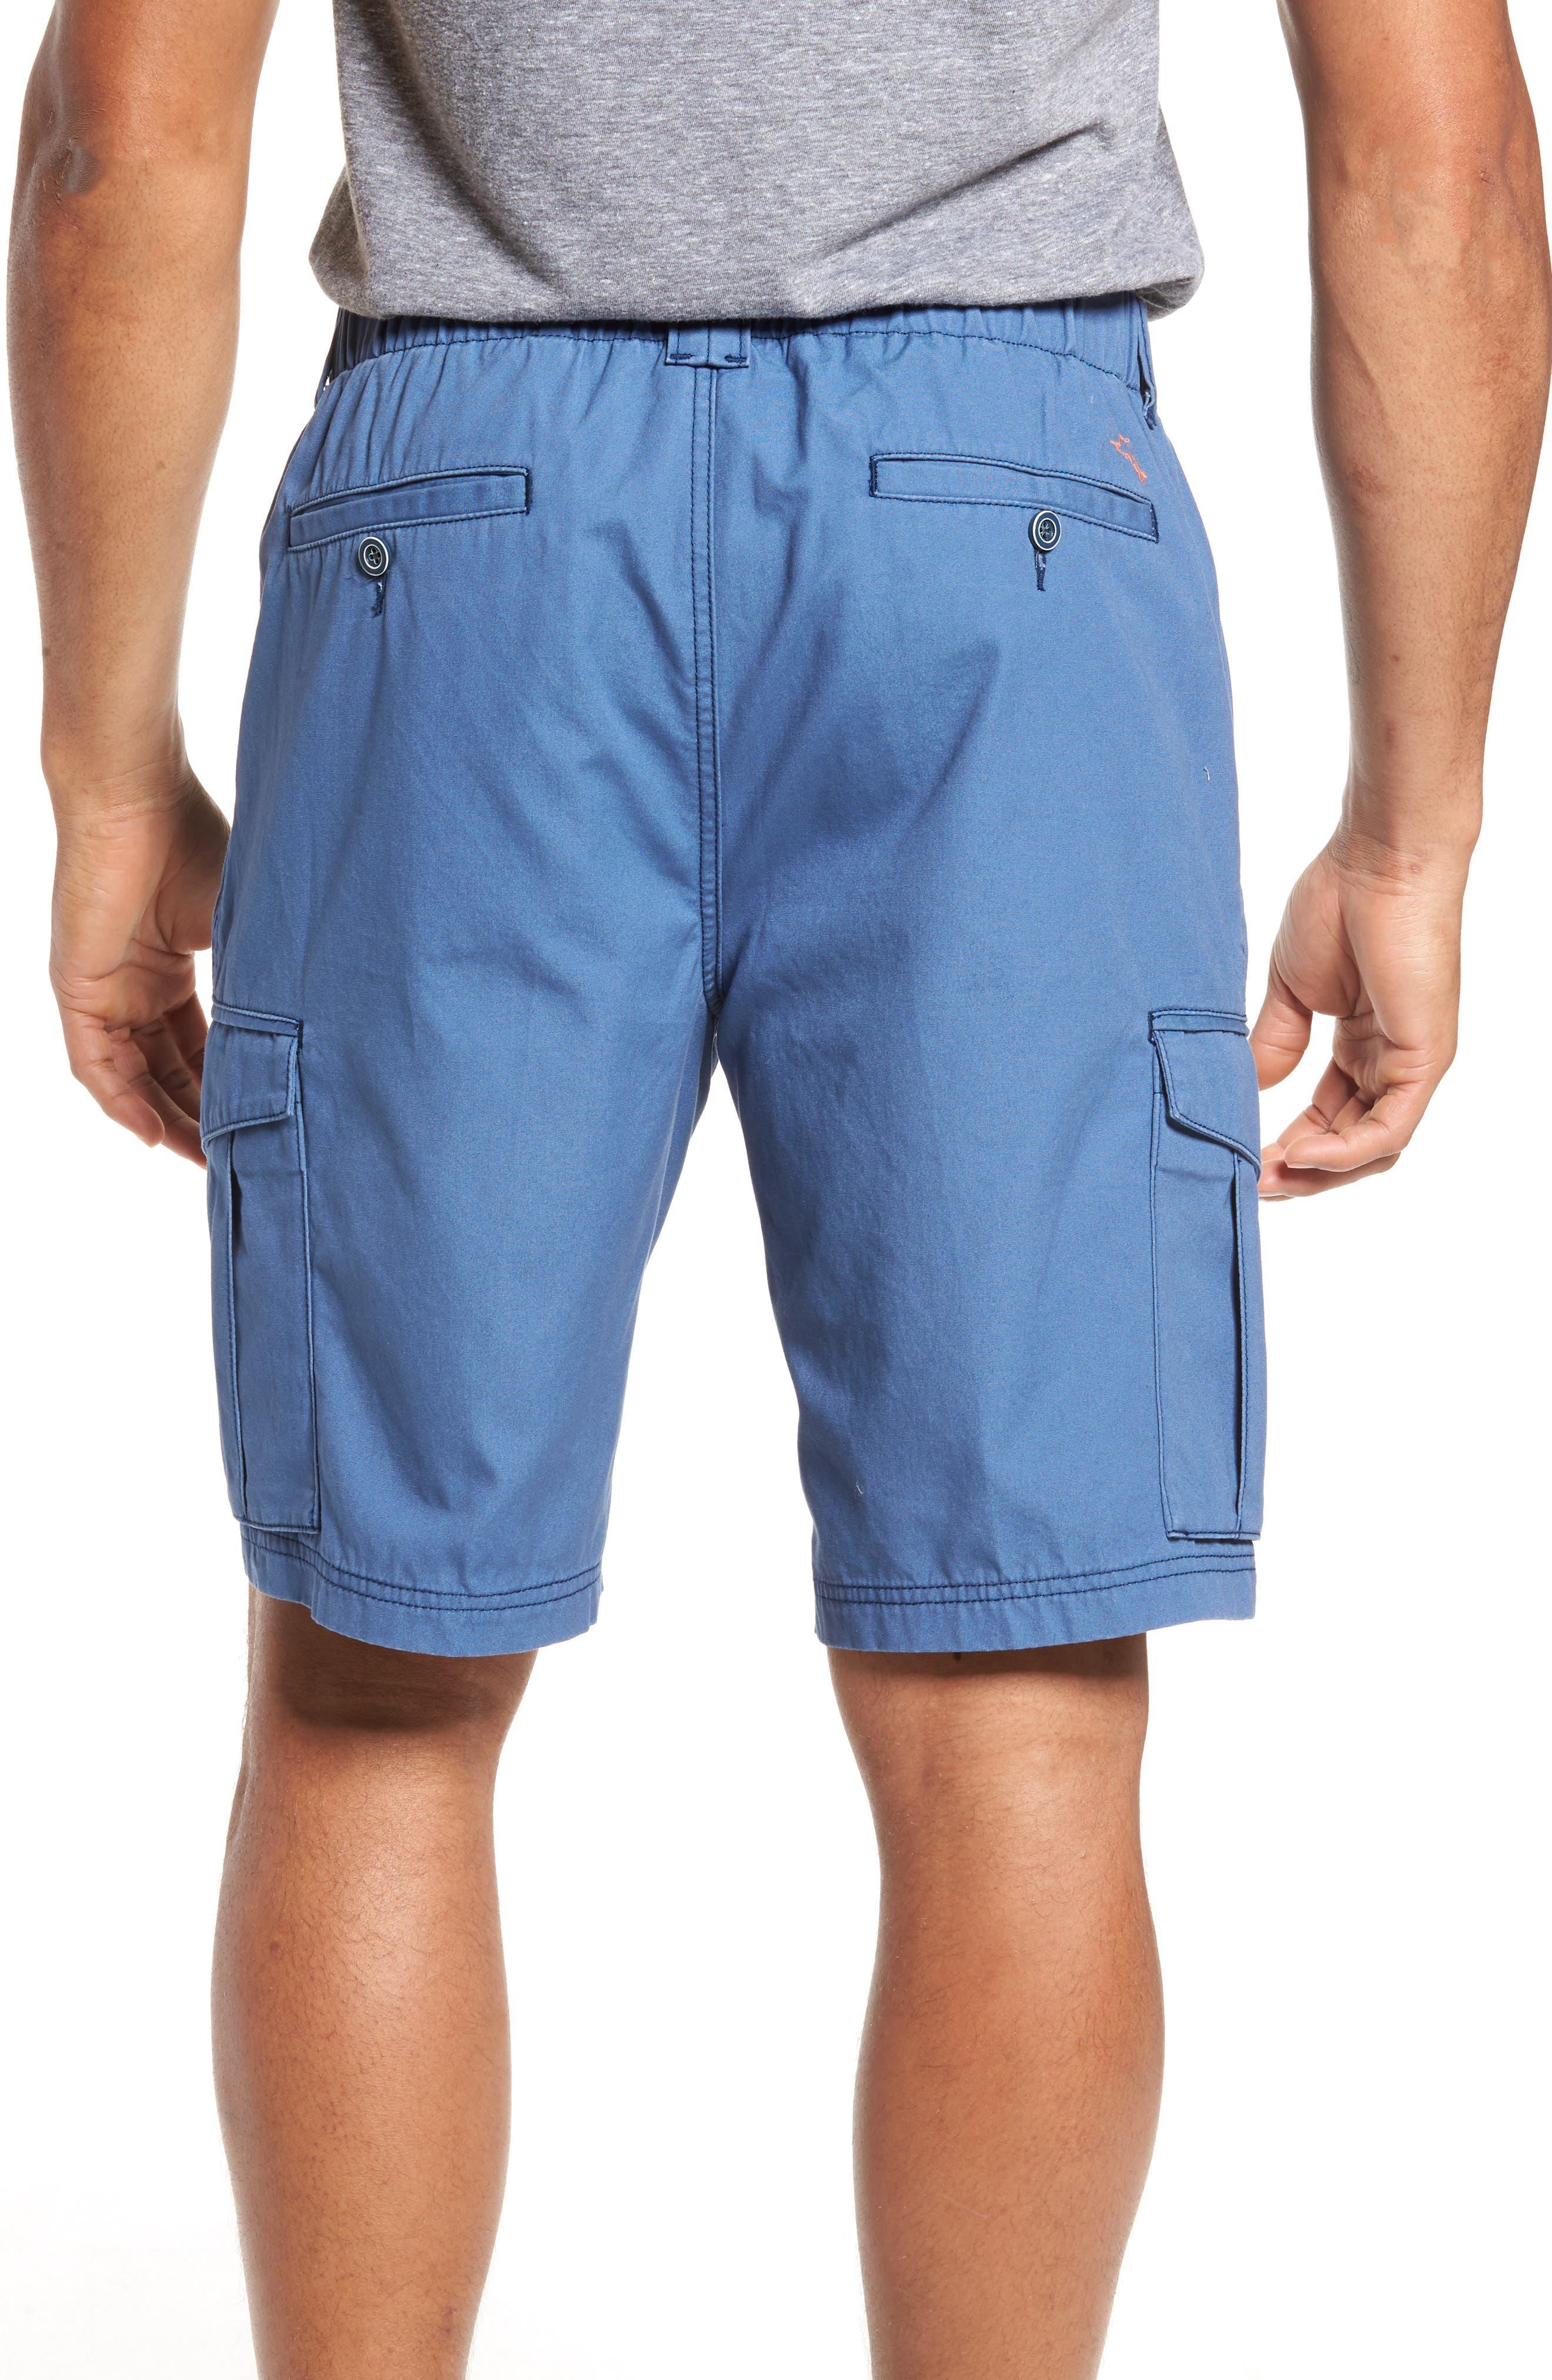 Island Survivalist Cargo Shorts,                             Alternate thumbnail 2, color,                             Dockside Blue